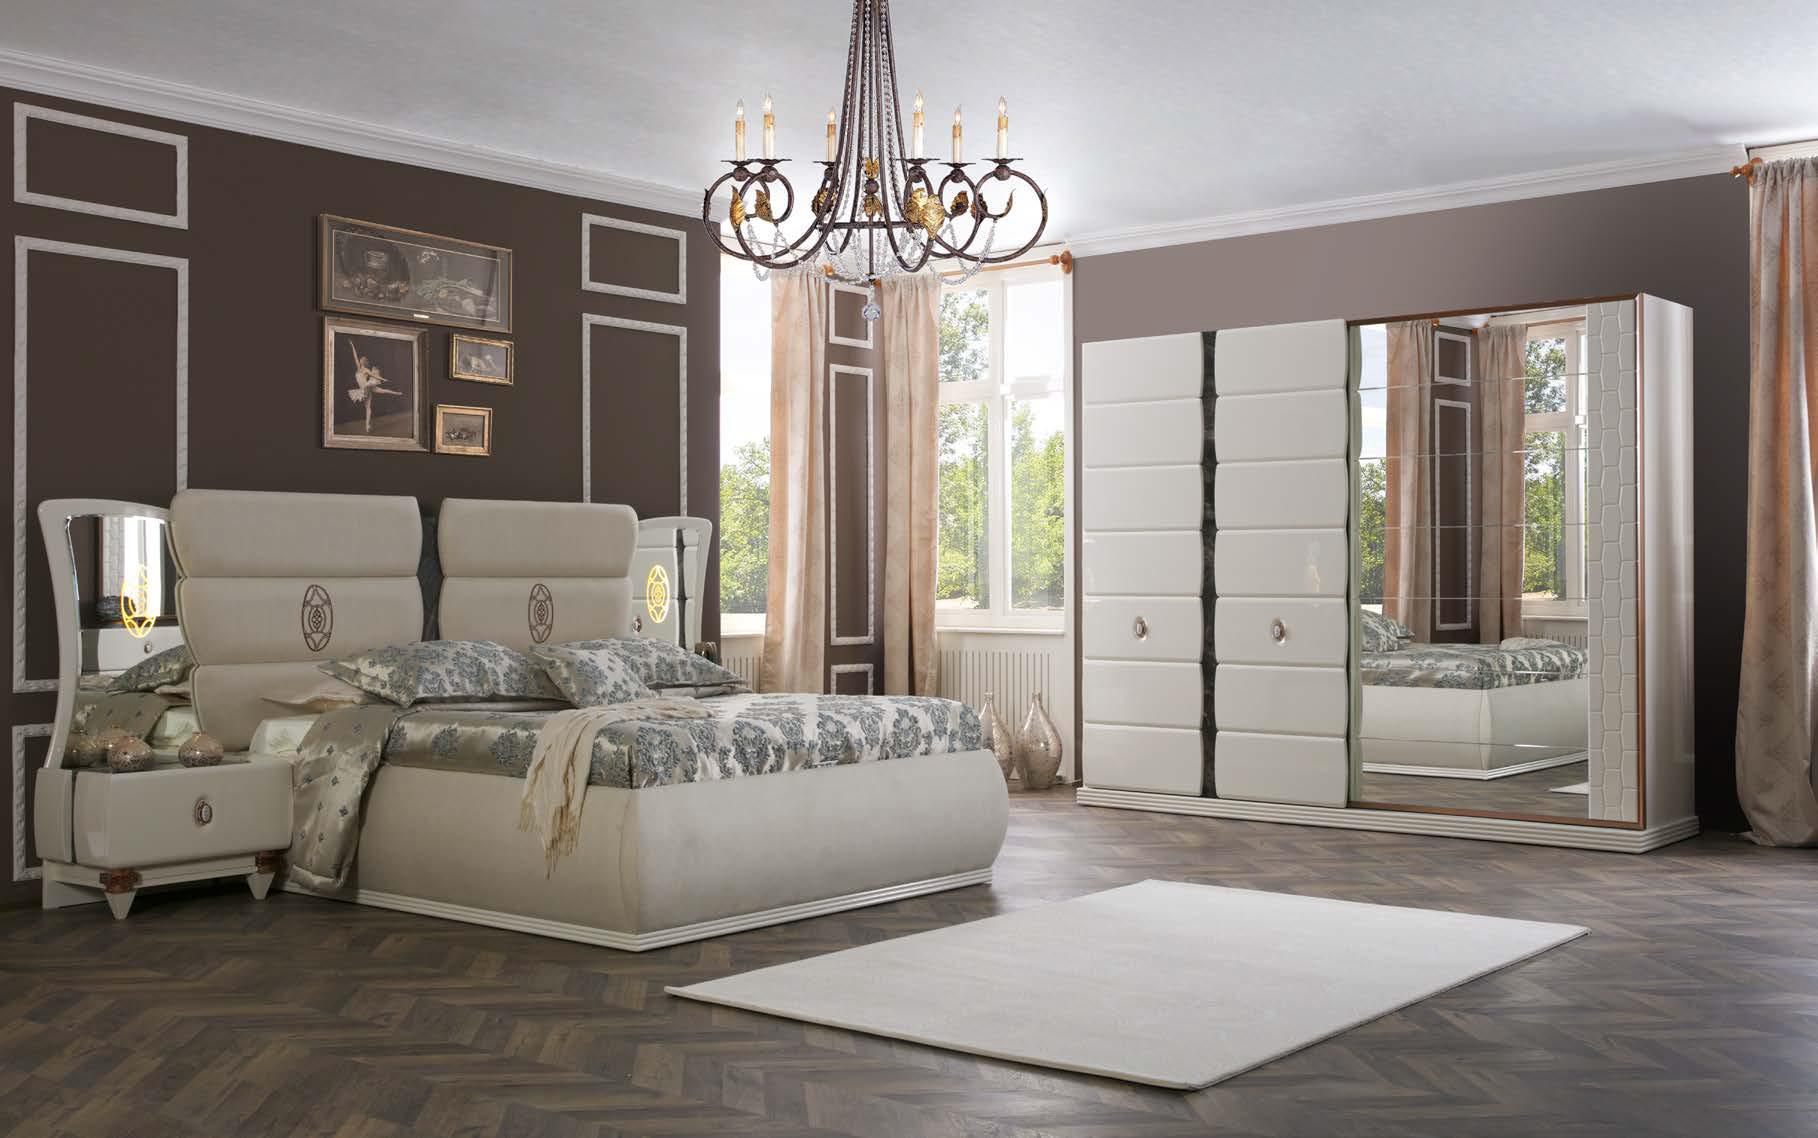 porto schlafzimmer yuvam m belhaus in wuppertal cilek. Black Bedroom Furniture Sets. Home Design Ideas